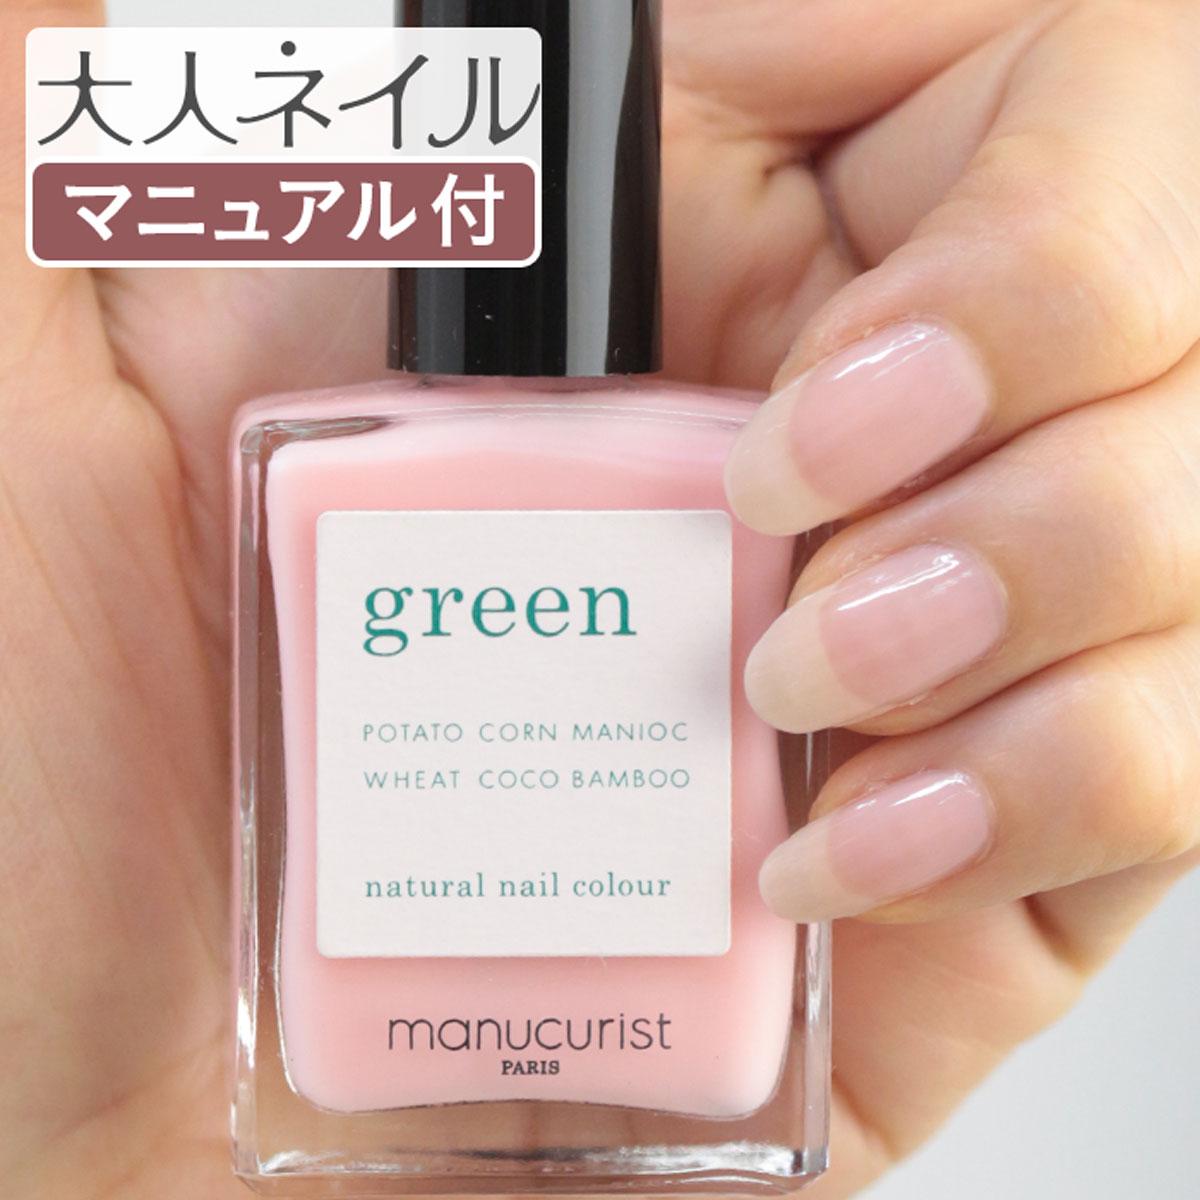 green グリーン ナチュラルネイルカラー オーテンシア 31001 15ml 爪にやさしい クリア シアー うすピンク オフィス ママネイル